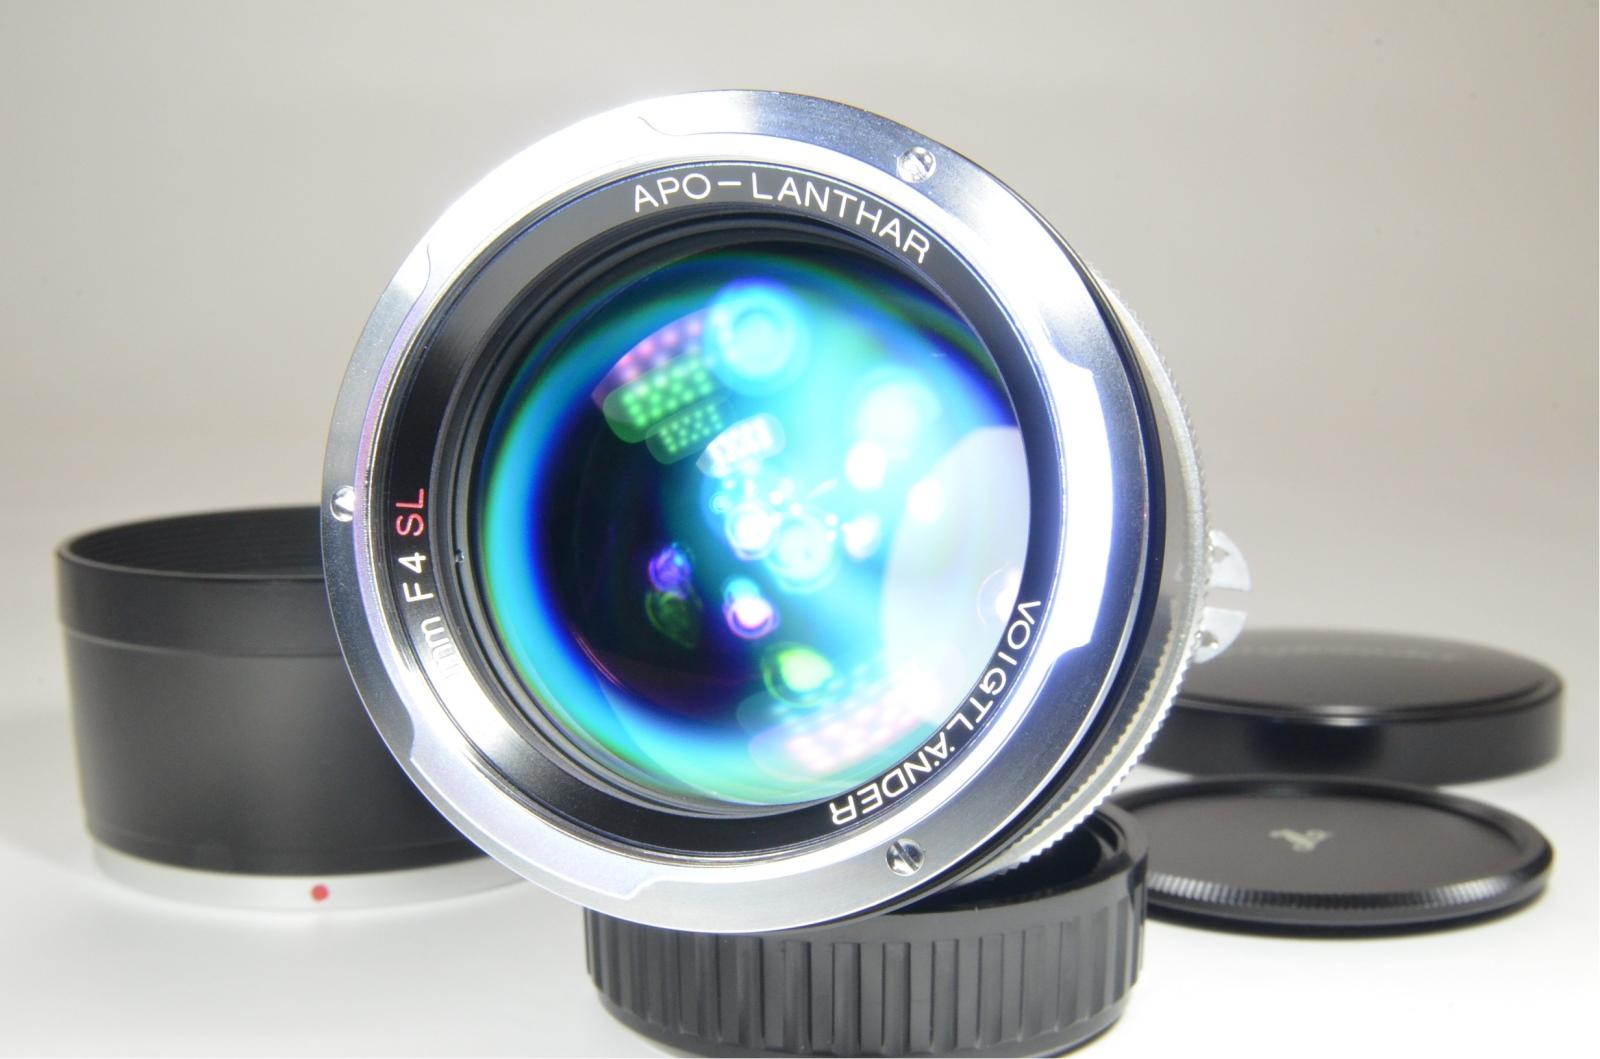 oigtlander apo-lanthar 180mm f4 sl for ai-s nikon w/ lens hood